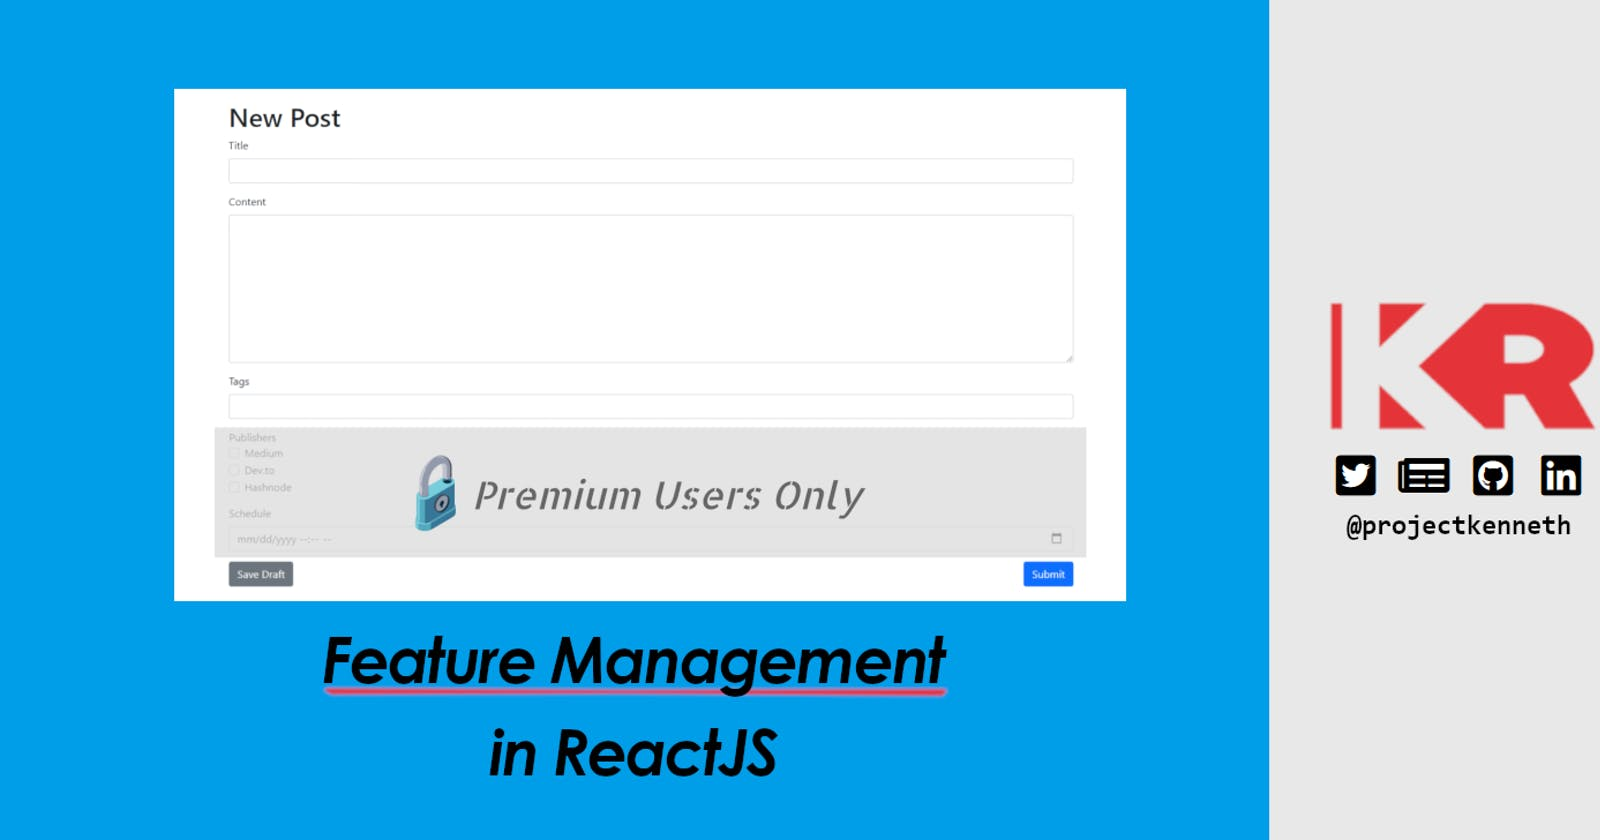 Feature Management in ReactJS